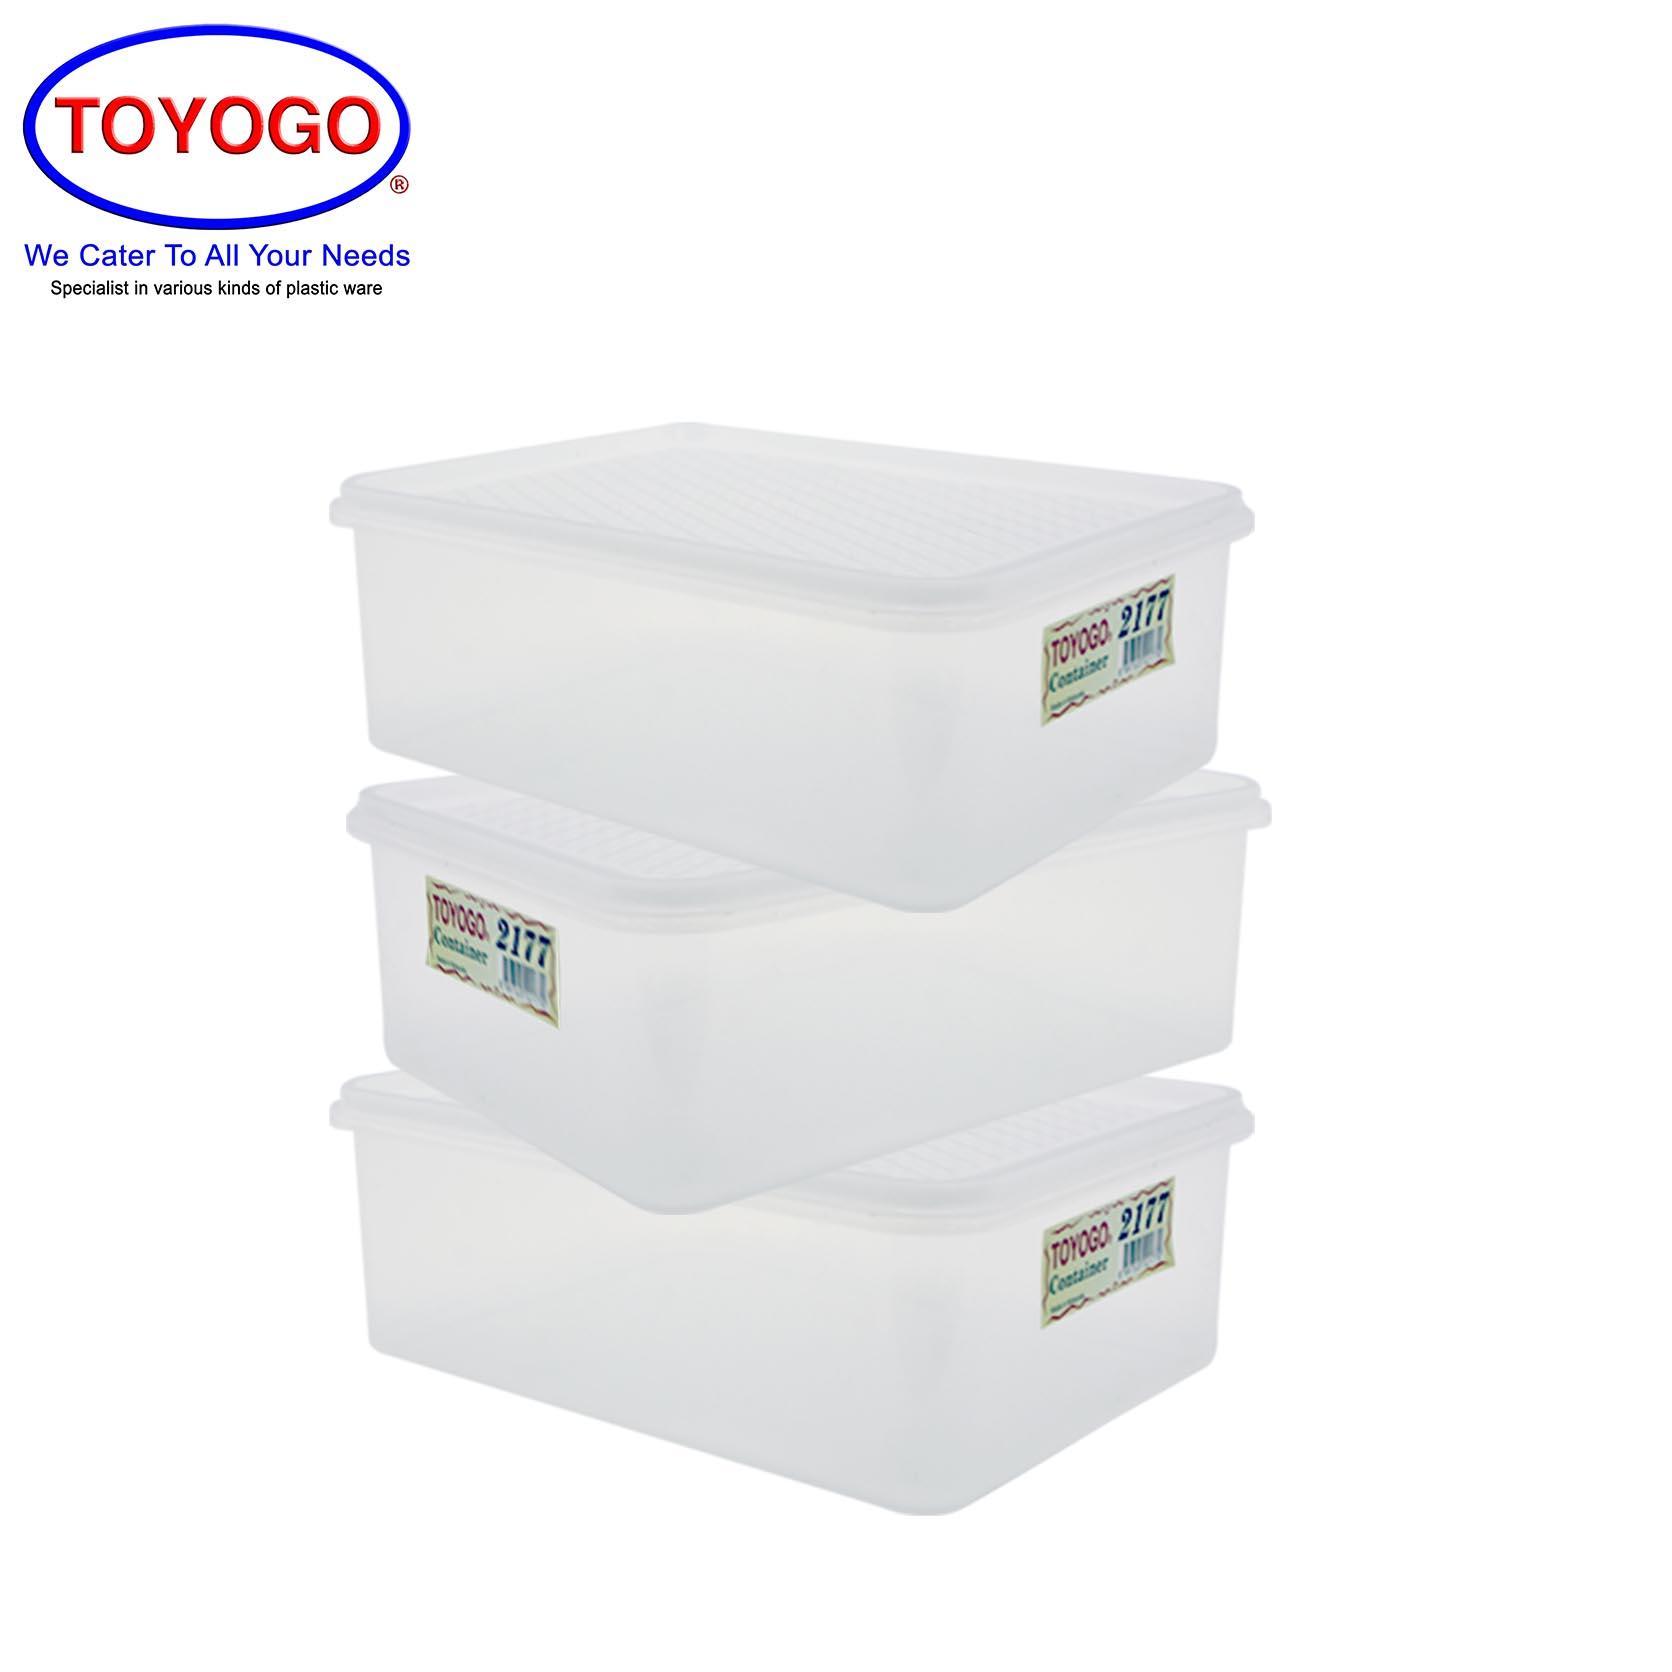 Toyogo Rectangular Box (Bundle of 3) (2177)